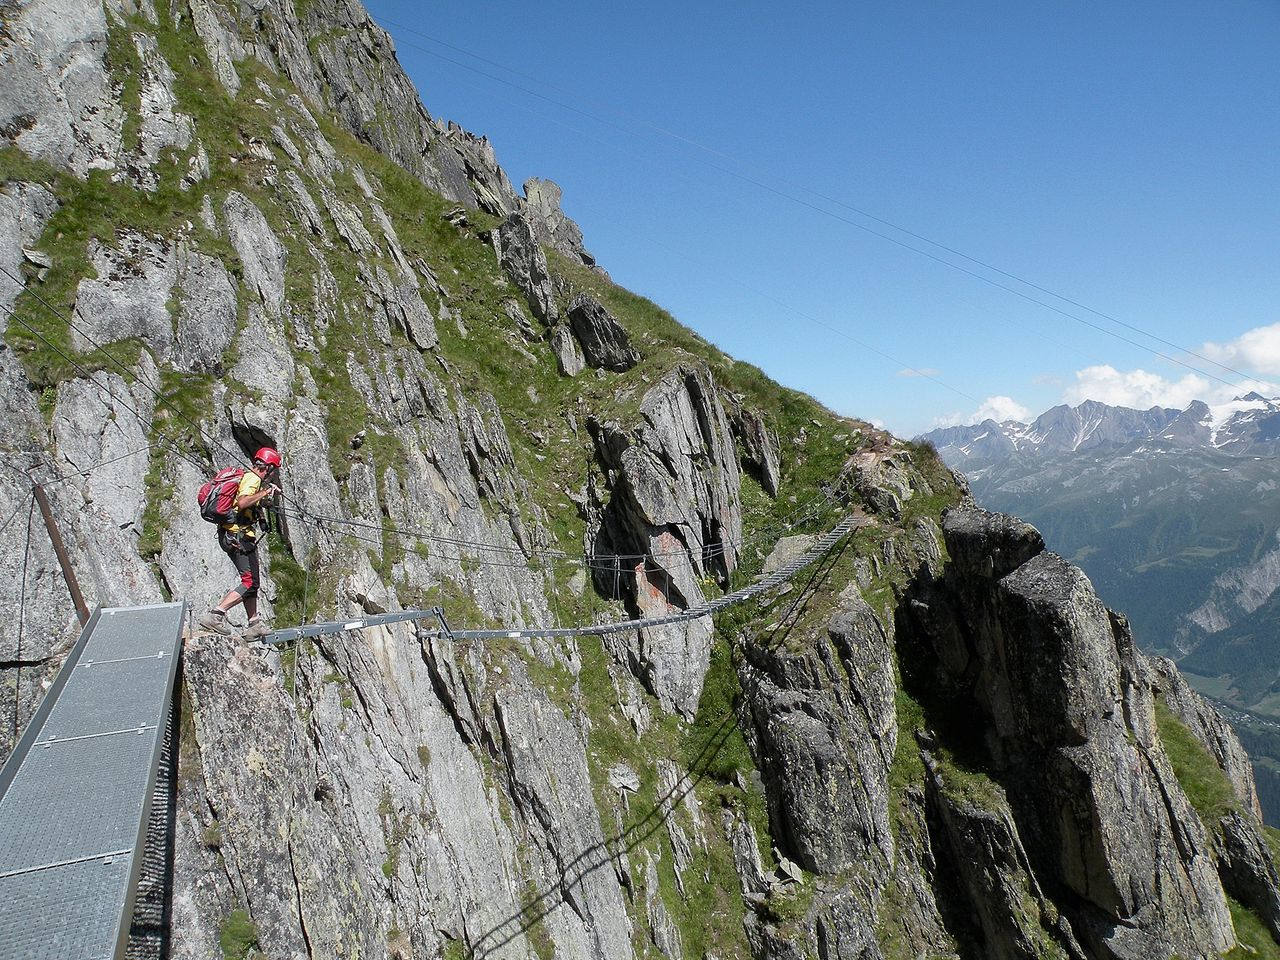 Klettersteig Eggishorn : Klettersteig eggishorn via ferrata swiss alpine